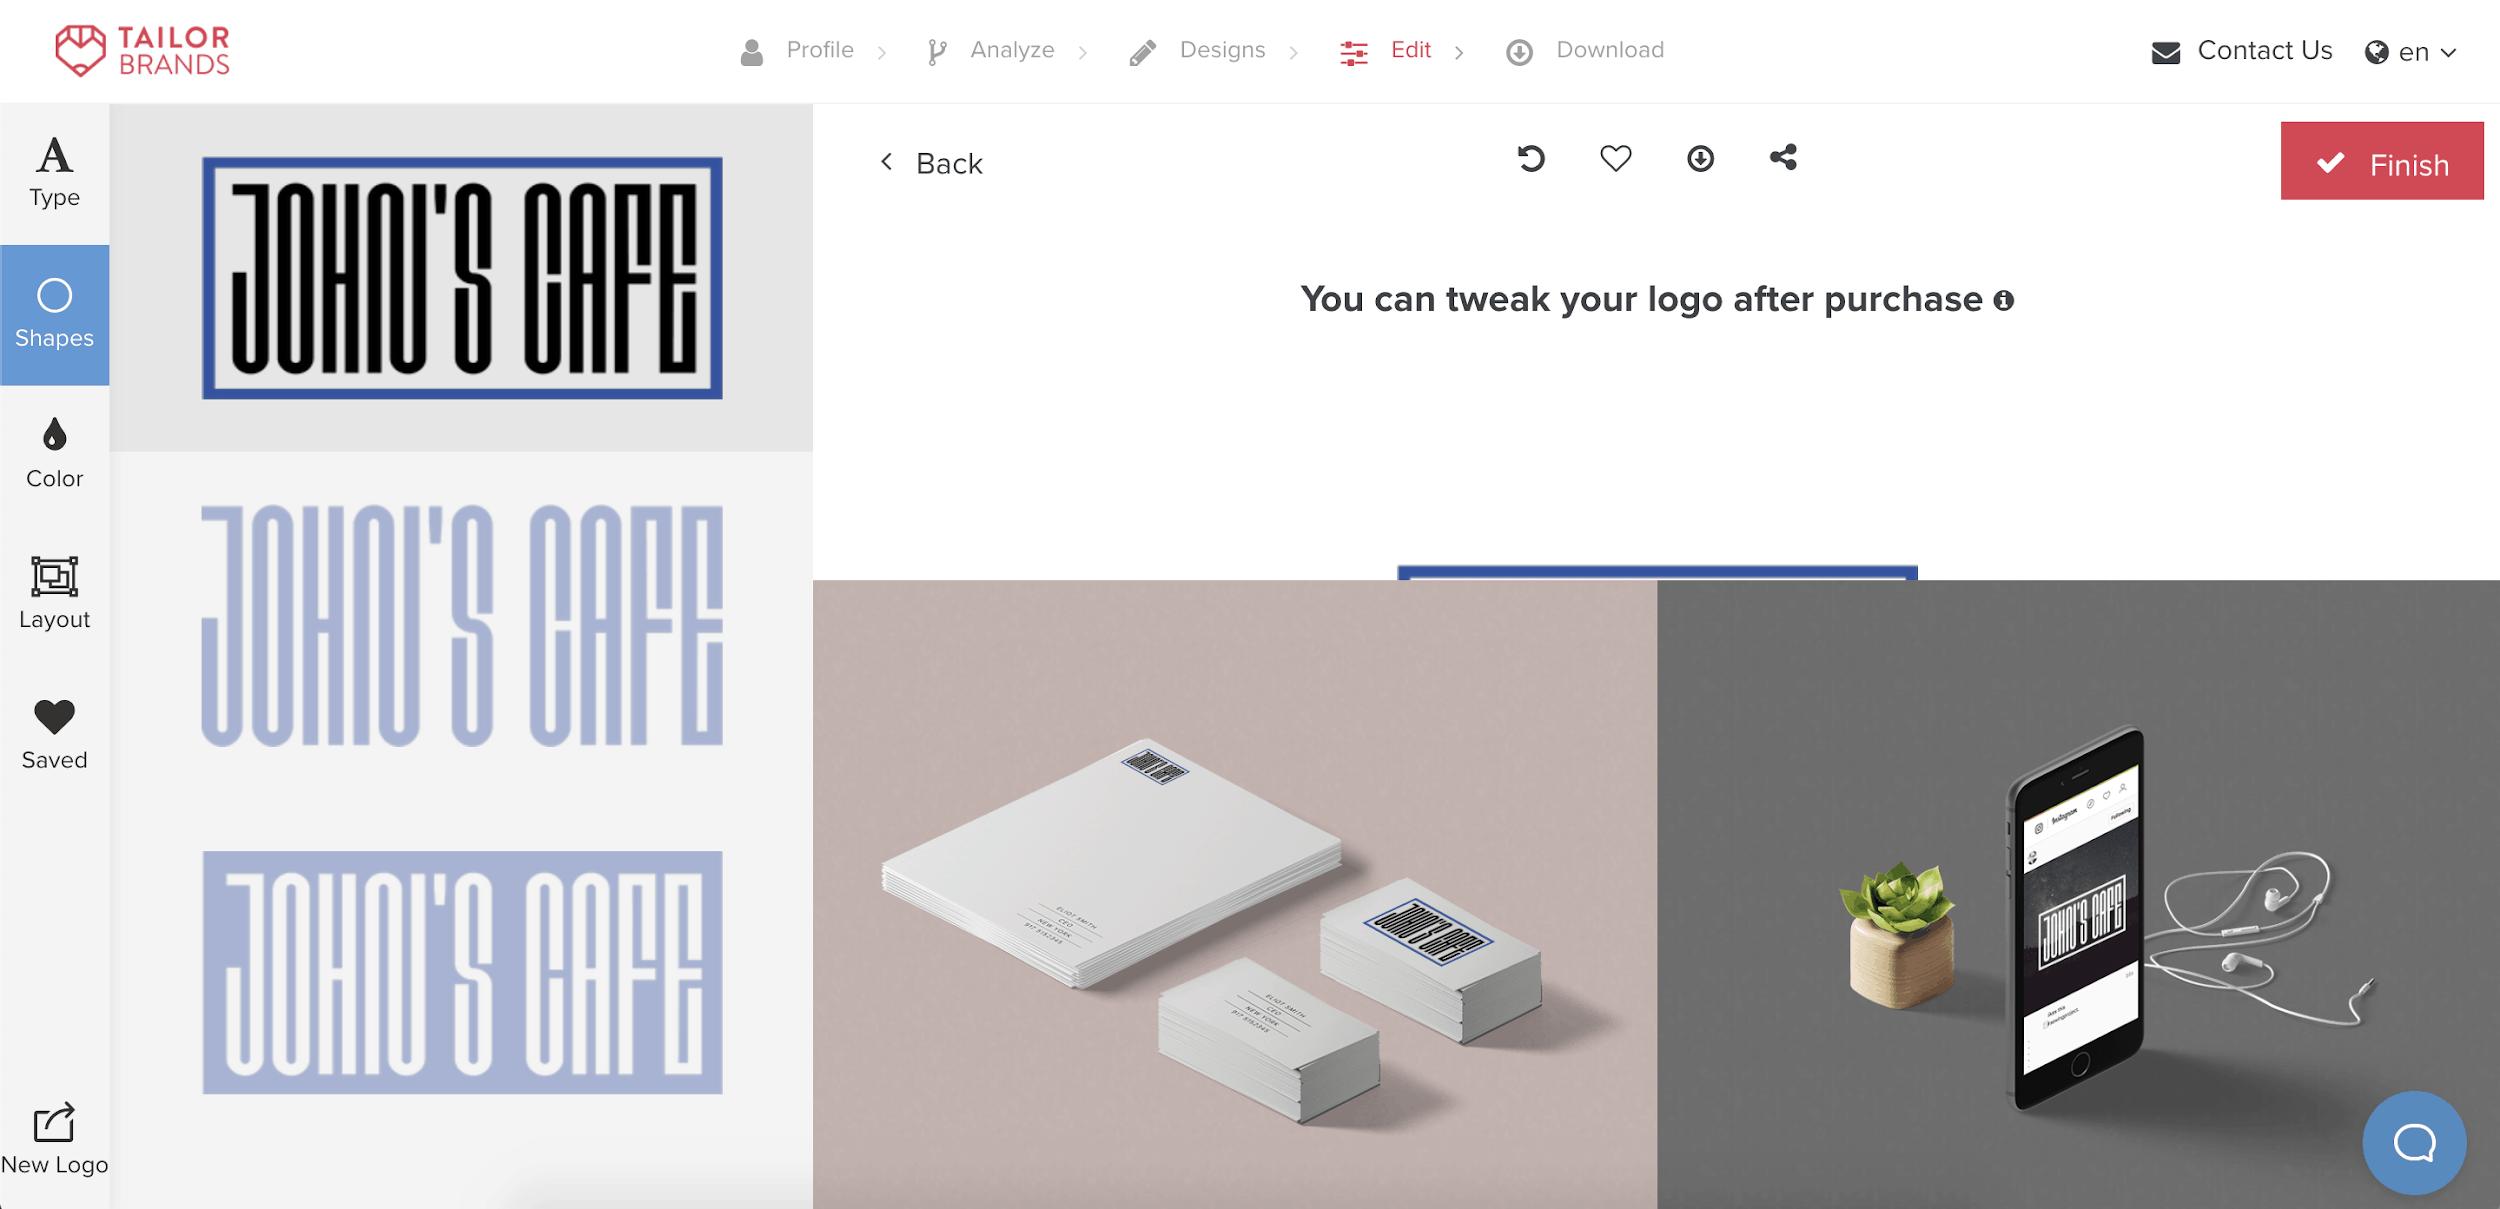 Tailor Brands screenshot - Shapes